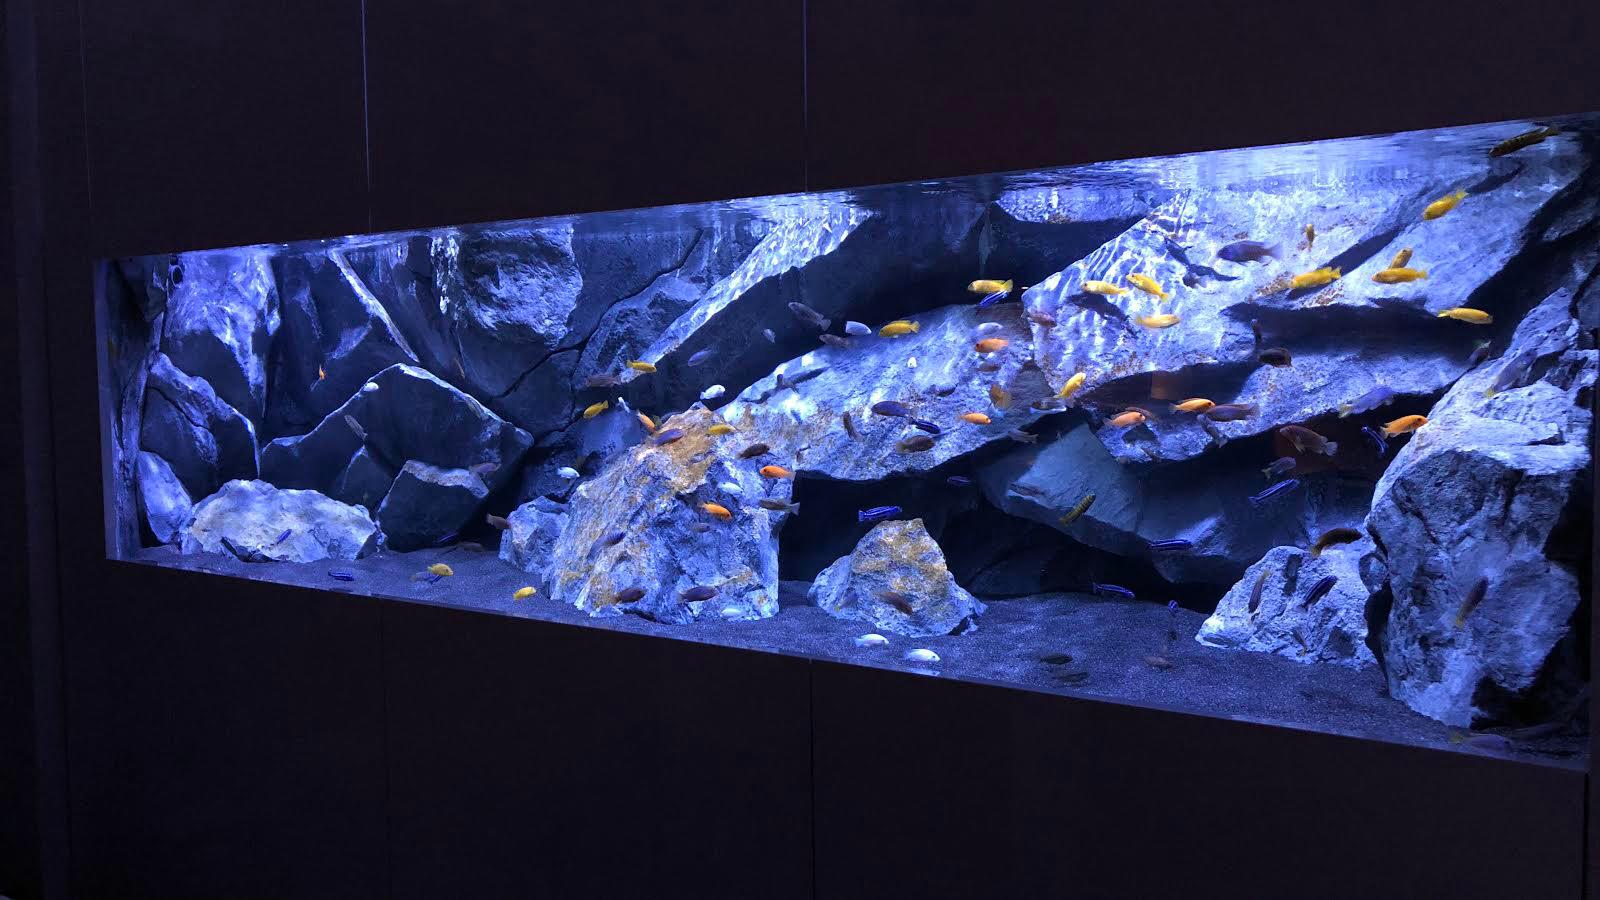 Epingle Par Aquadecor Sur Aquadecor Aquariums